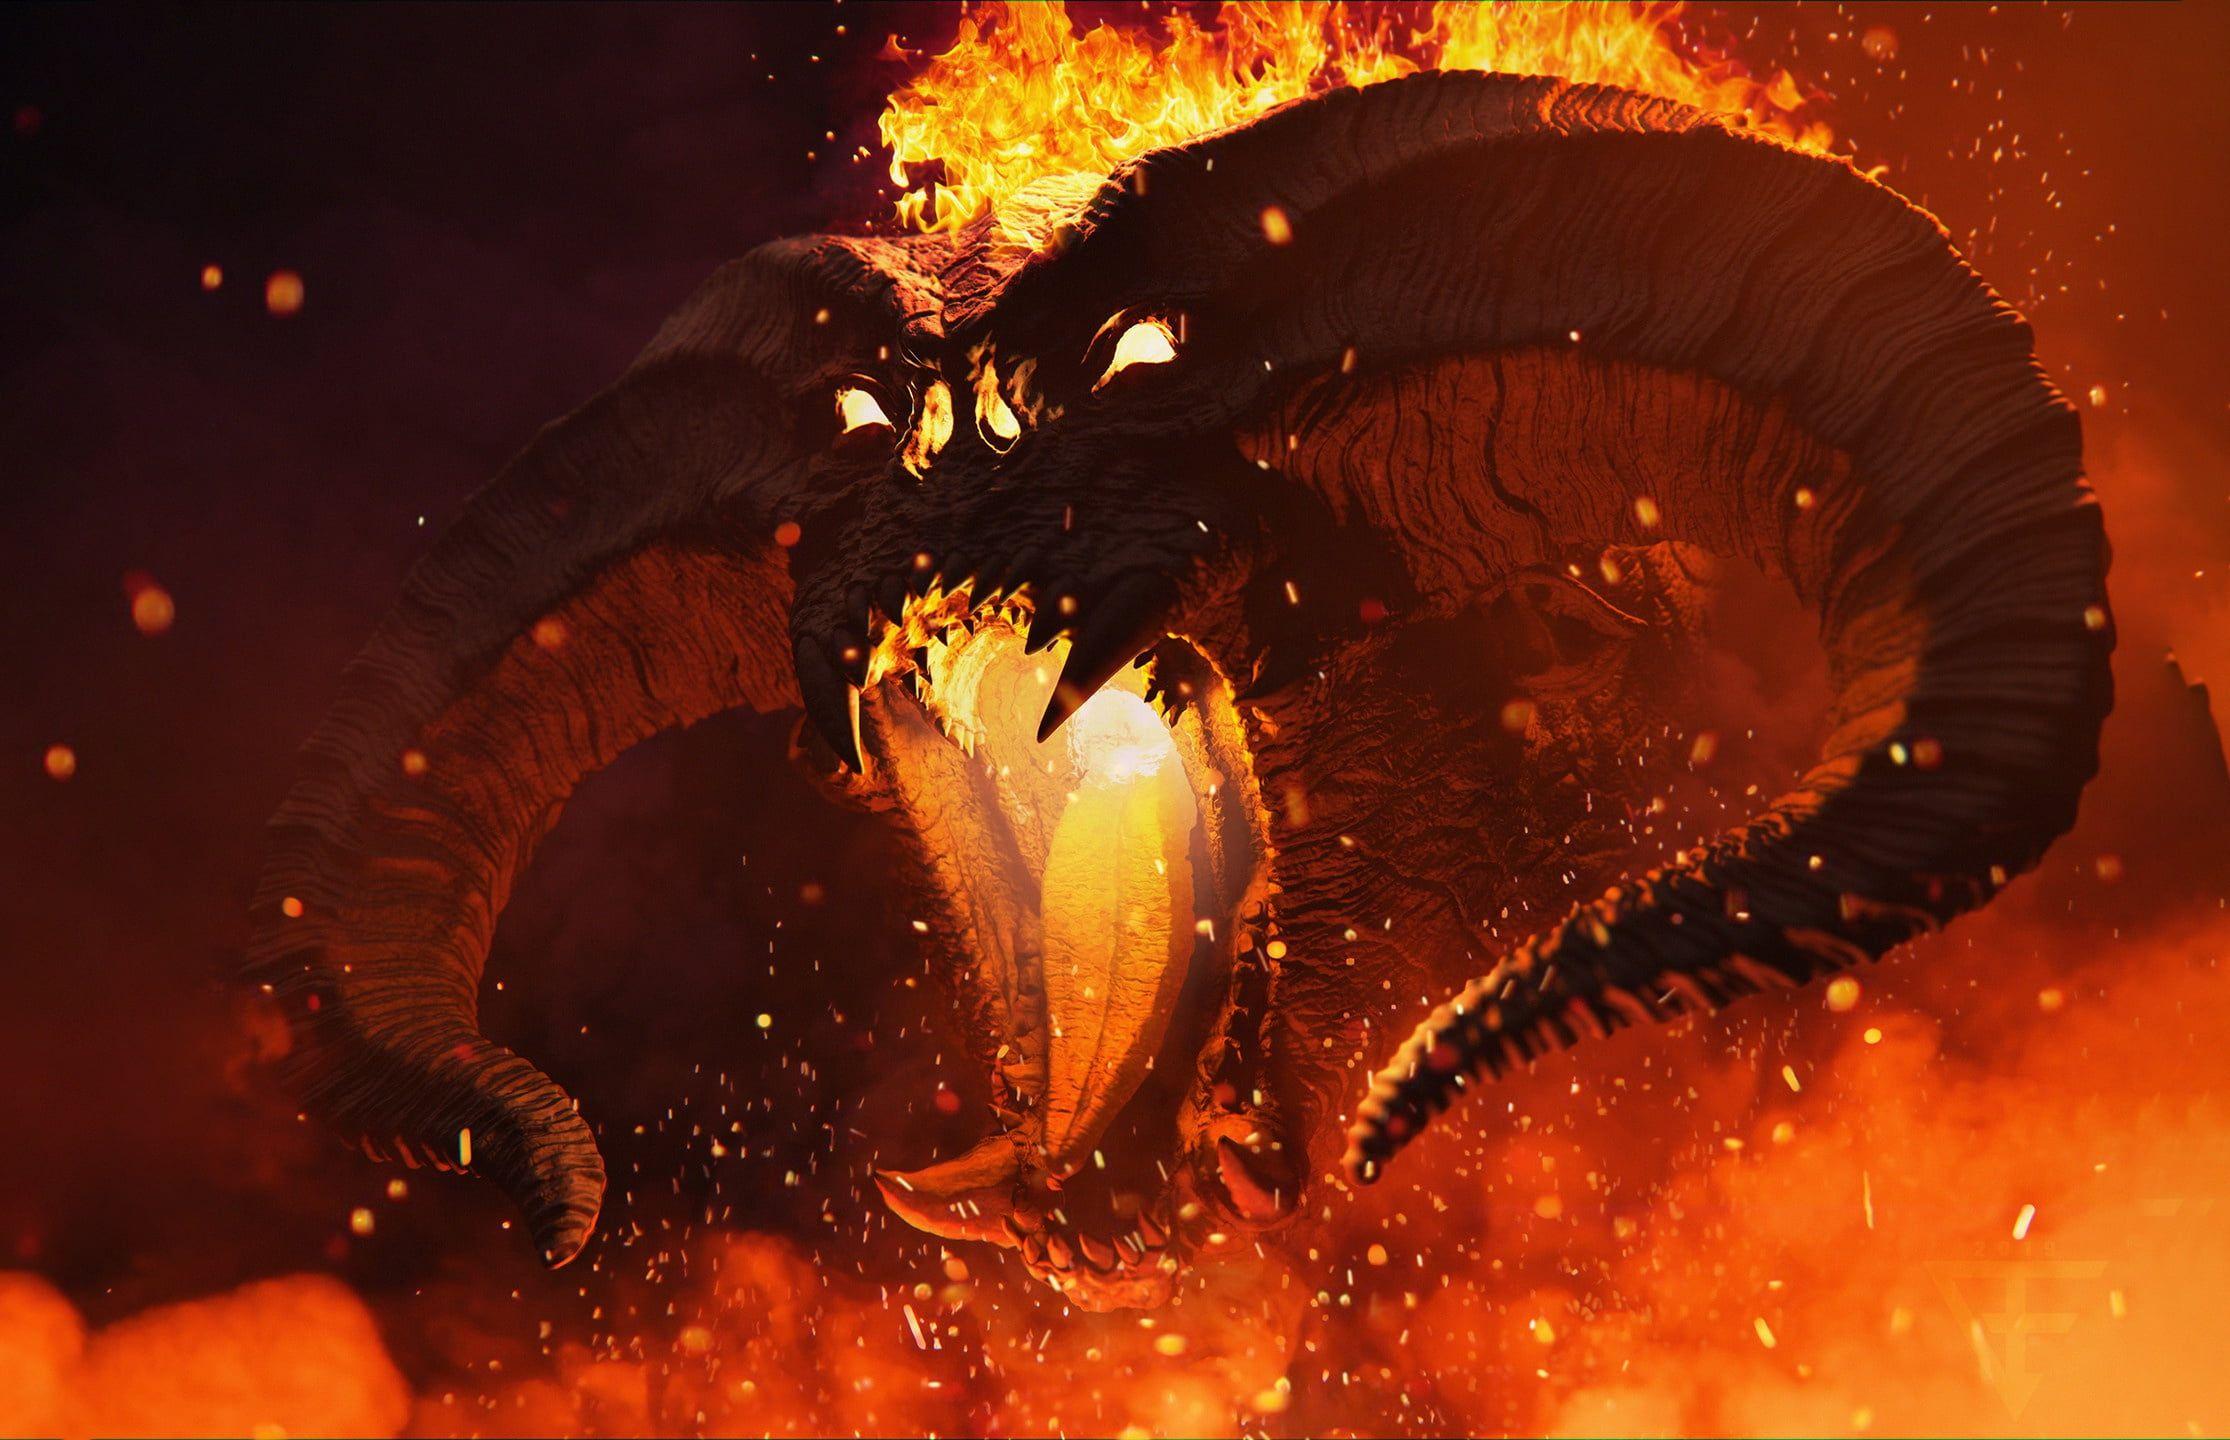 Balrog Demon The Lord Of The Rings Fantasy Art Creature 1080p Wallpaper Hdwallpaper Desktop In 2020 Lord Of The Rings Tattoo Balrog Lord Of The Rings